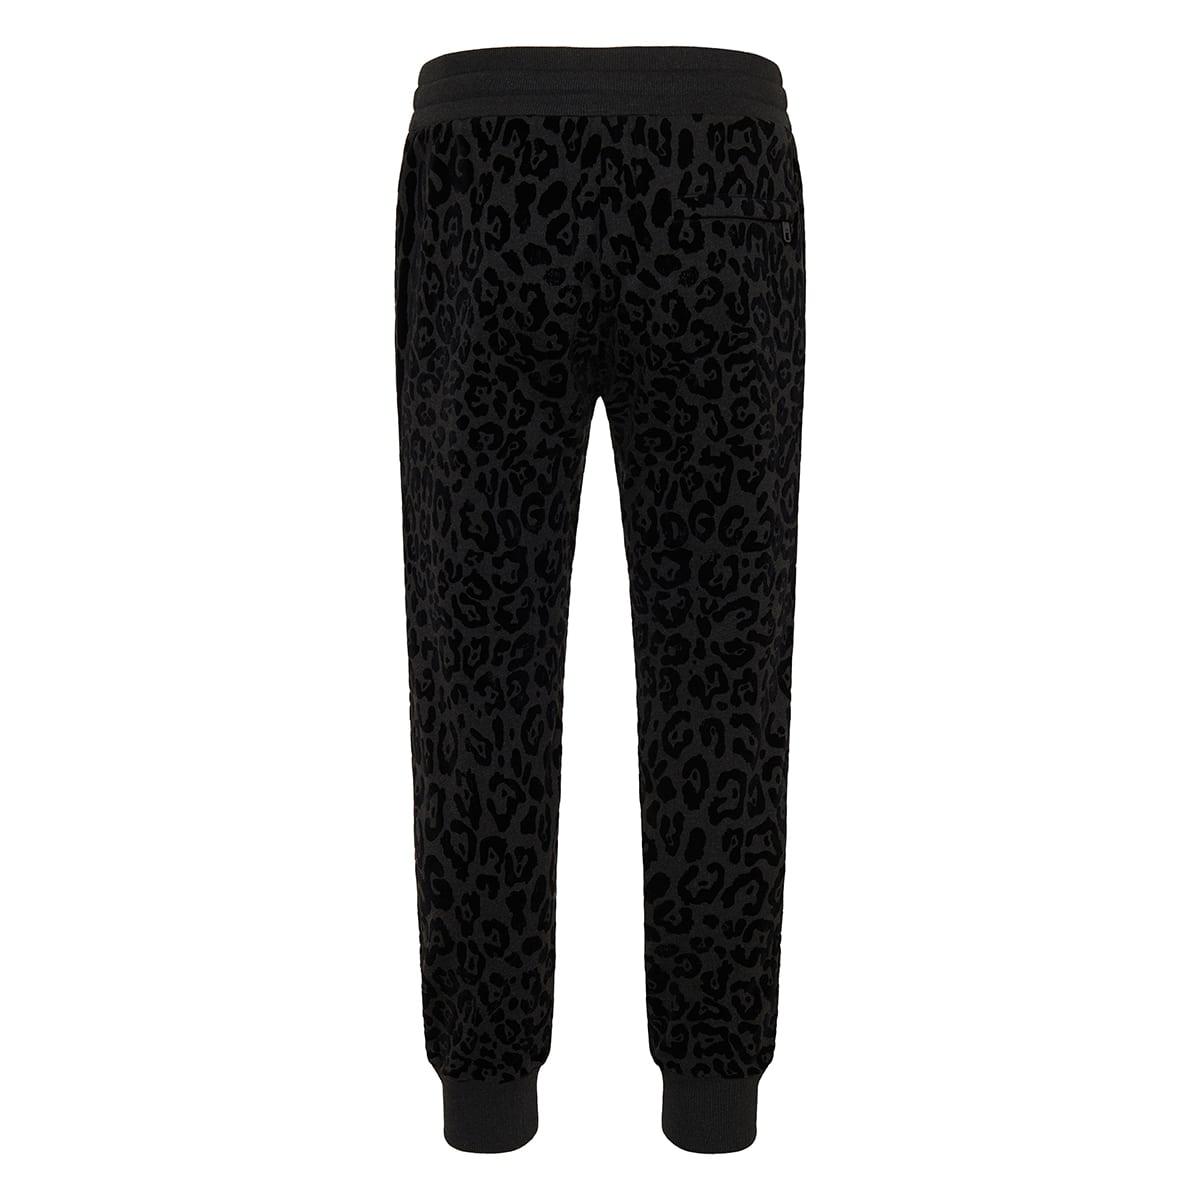 Leopard cotton track trousers